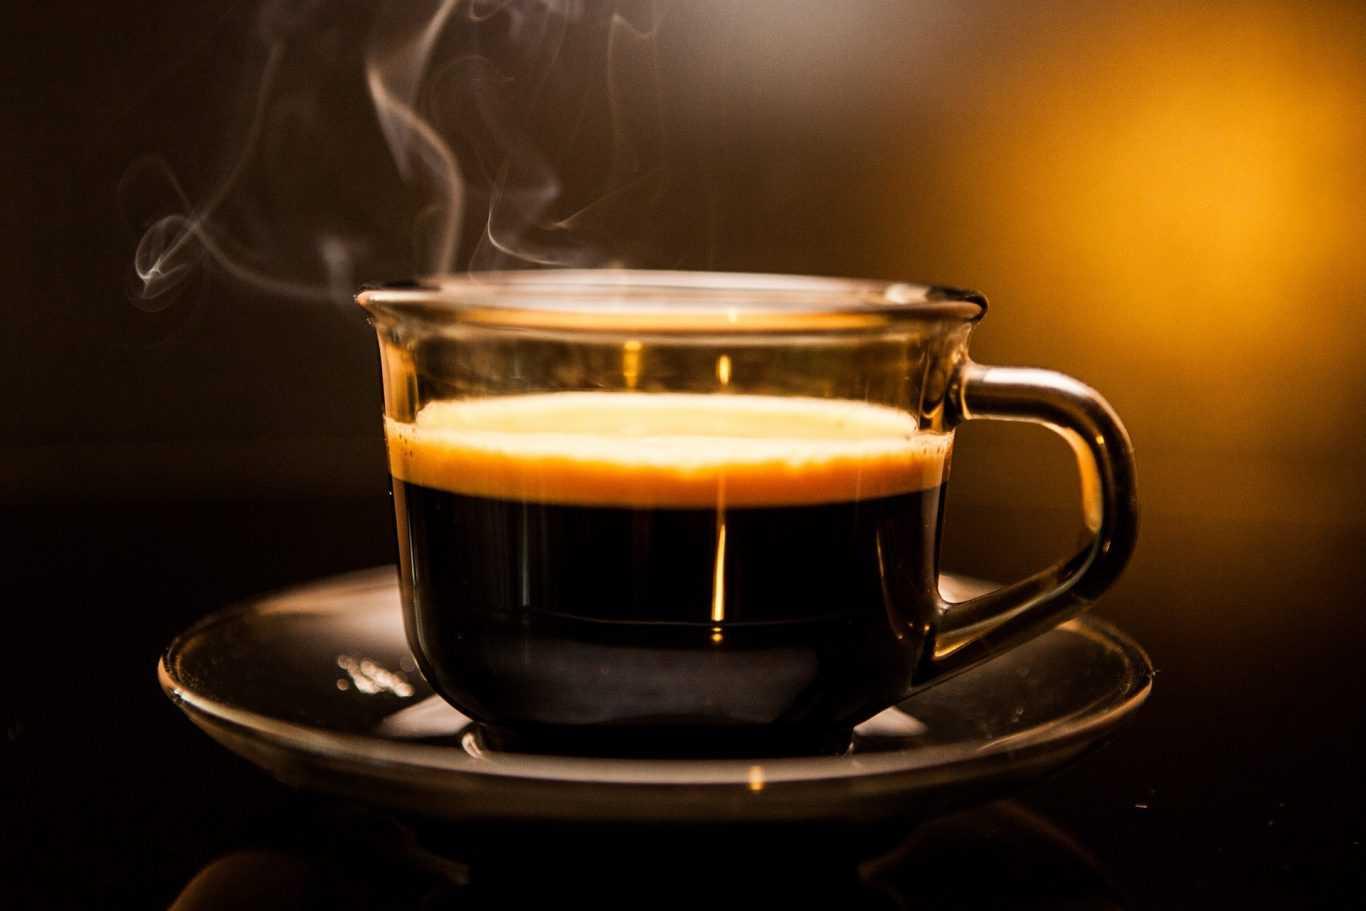 kawy mielone ziarniste palone cafe creator sklep producent 17